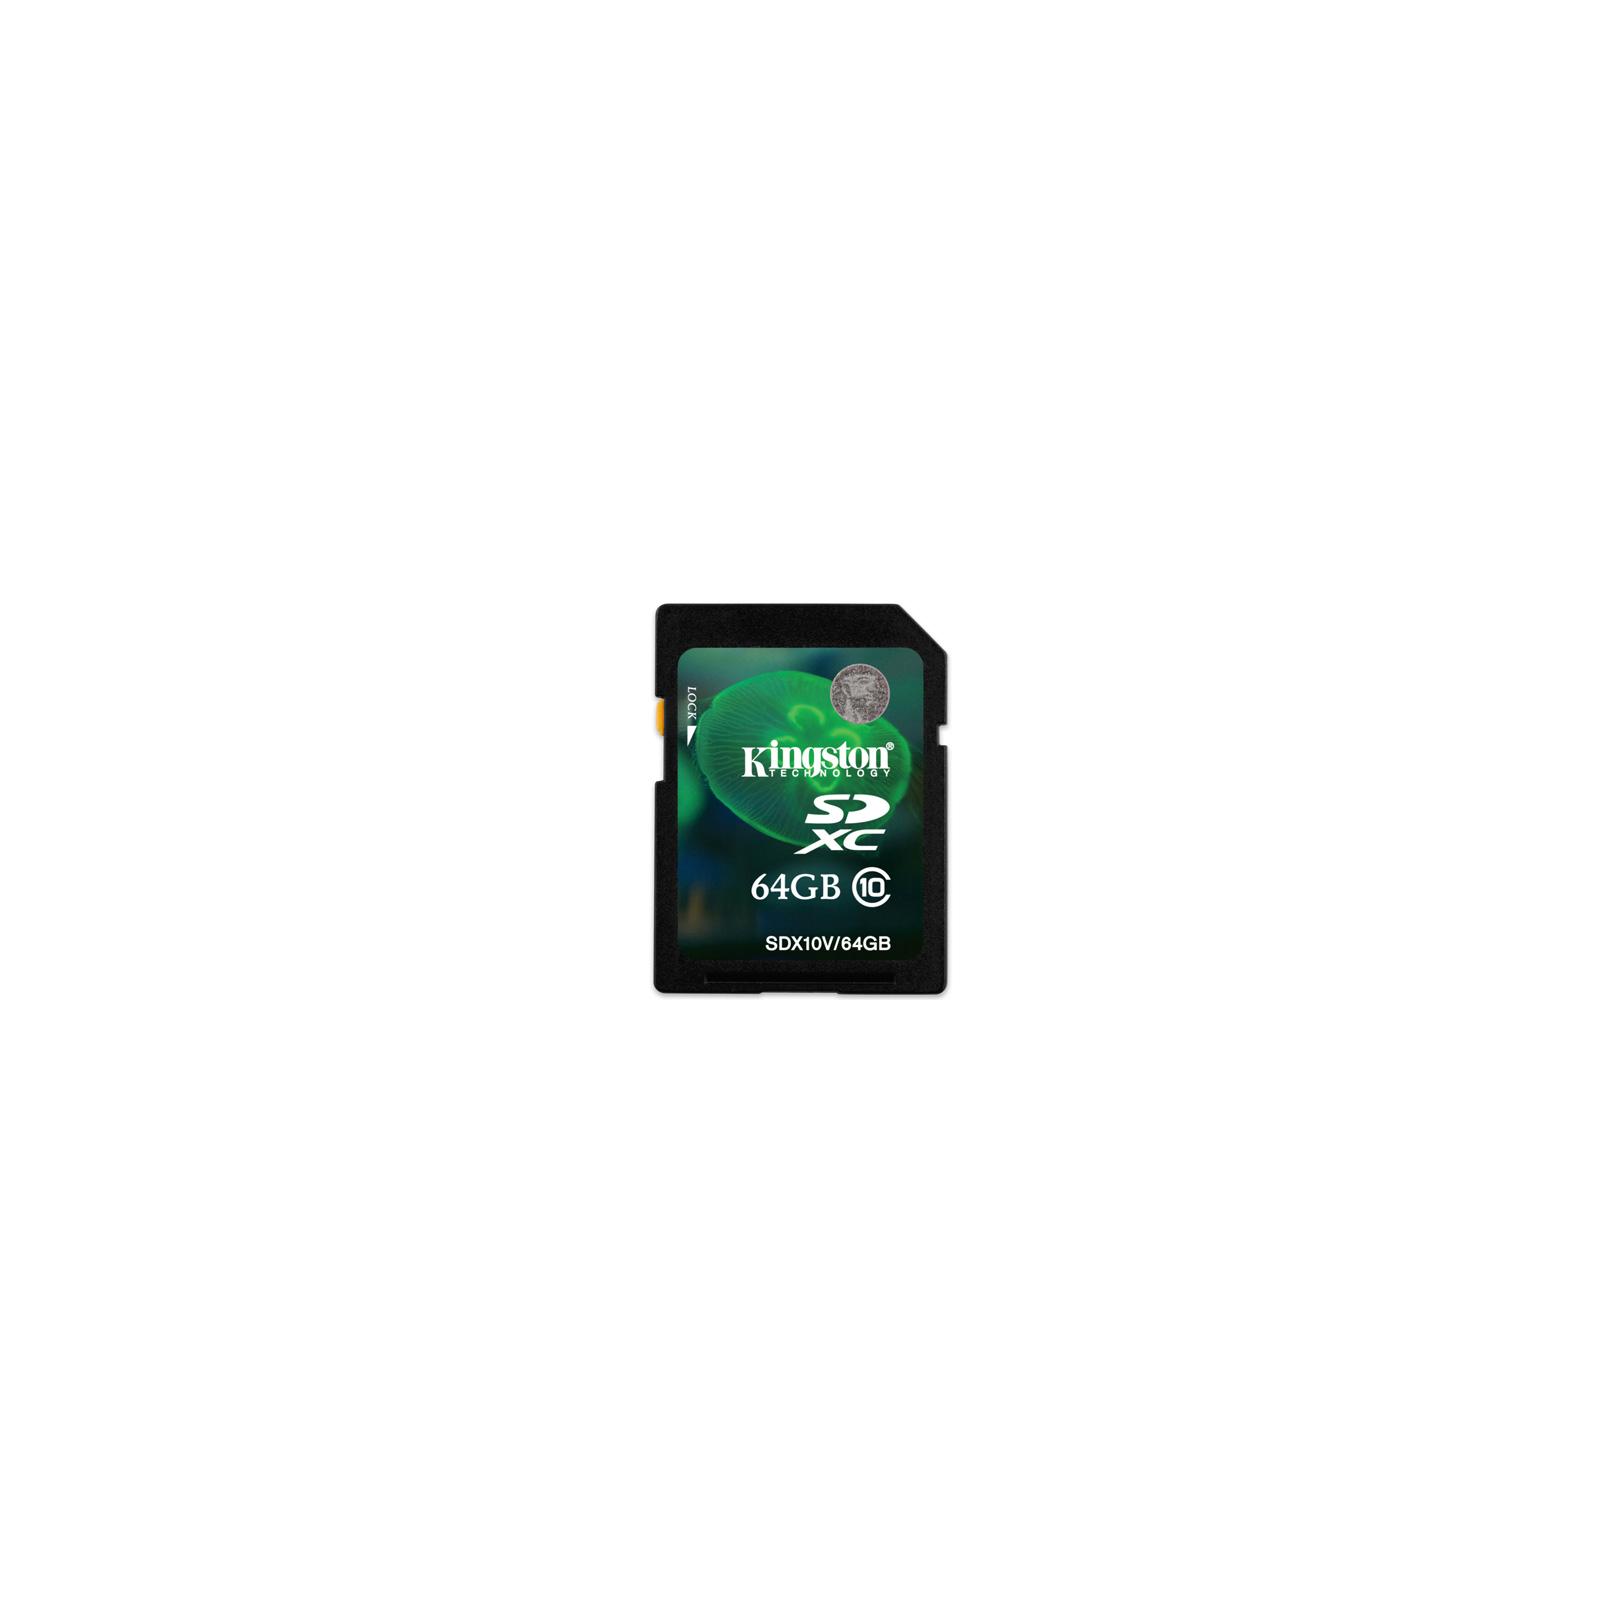 Карта памяти Kingston 64Gb SDXC class 10 (SDX10V/64GB)